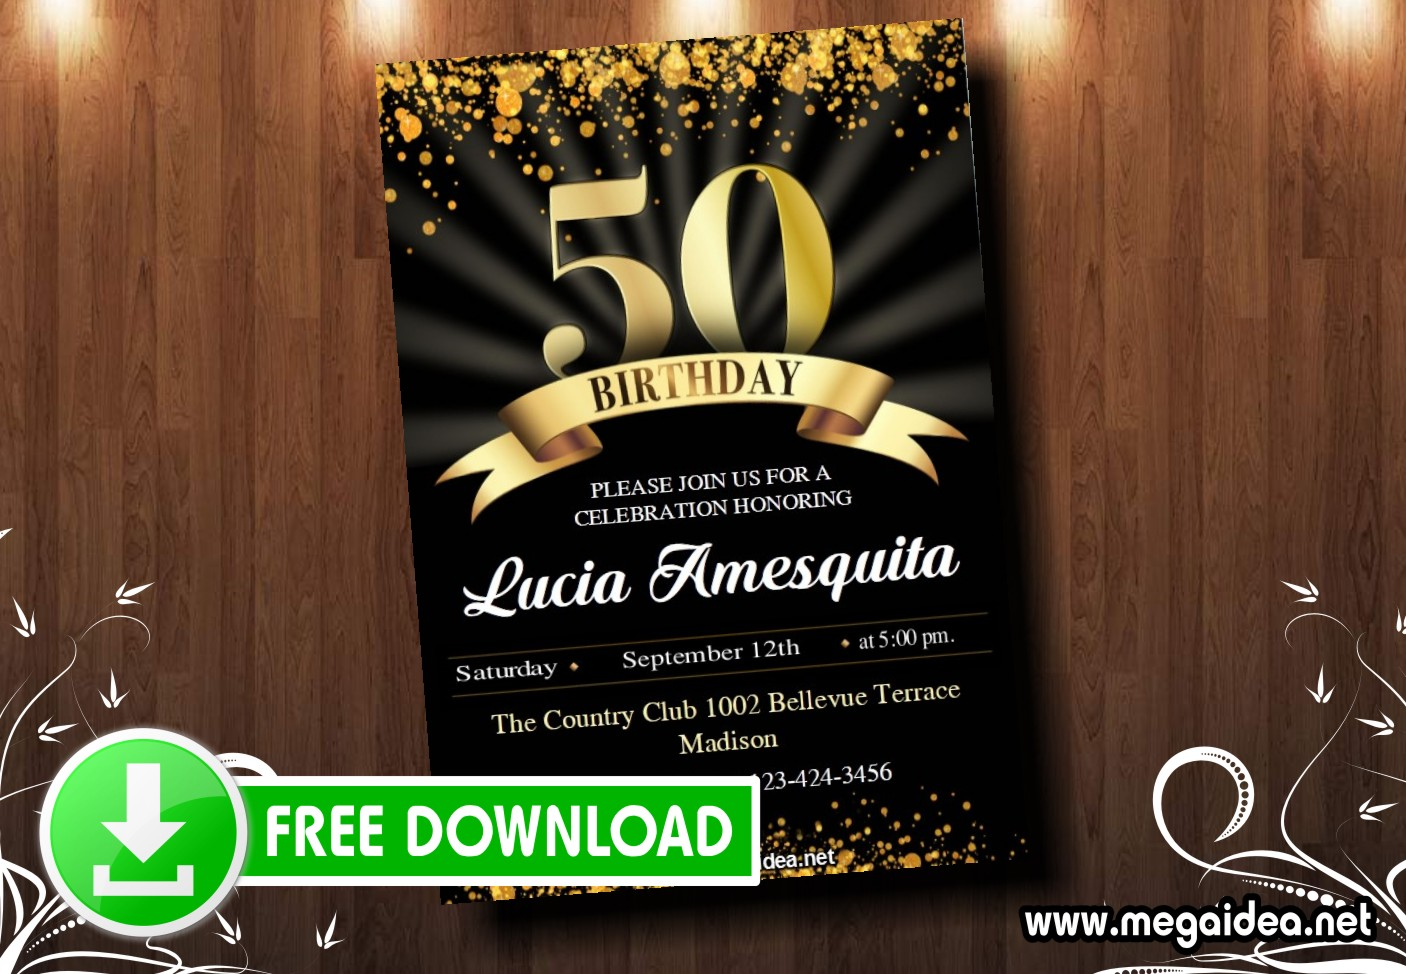 50 Birthday Invitation MUESTRA222